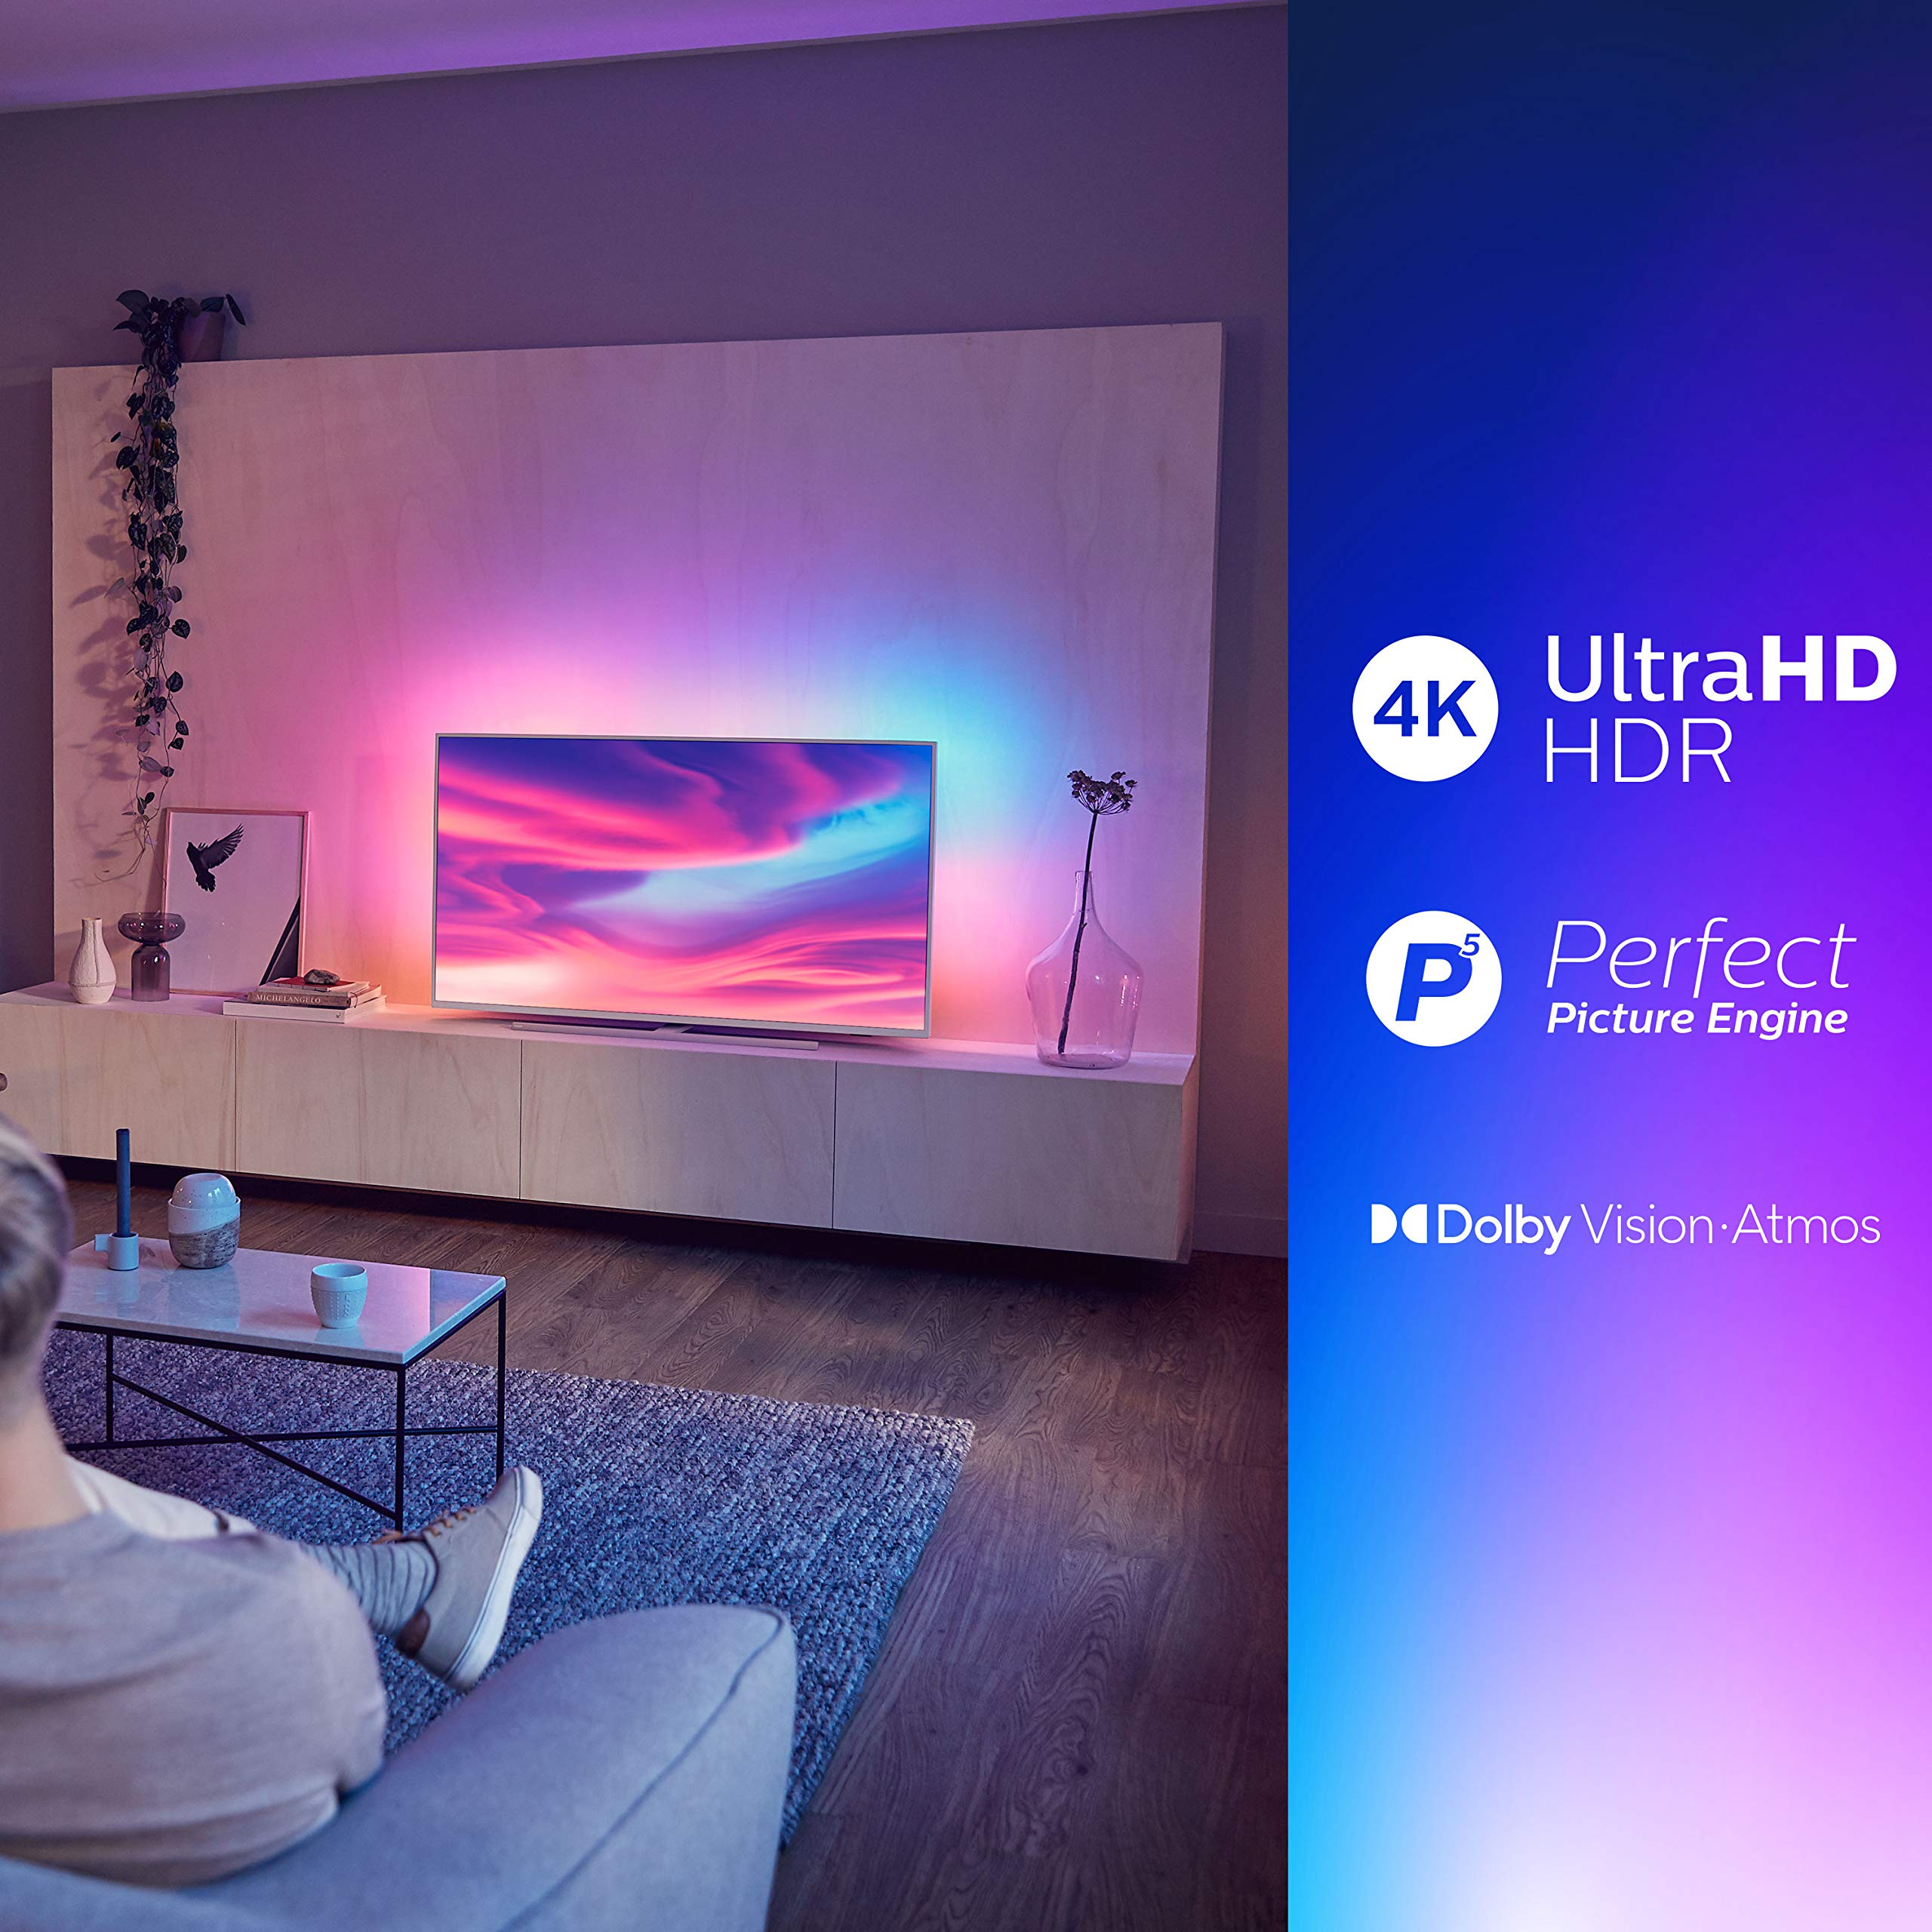 Televisor Philips Ambilight 43PUS7304/12 Smart TV de 108 cm (43 pulgadas) con 4K UHD, LED TV, HDR 10+, Android TV, Google Assistant, Dolby Atmos y compatibilidad con Alexa, color plata claro: Philips: